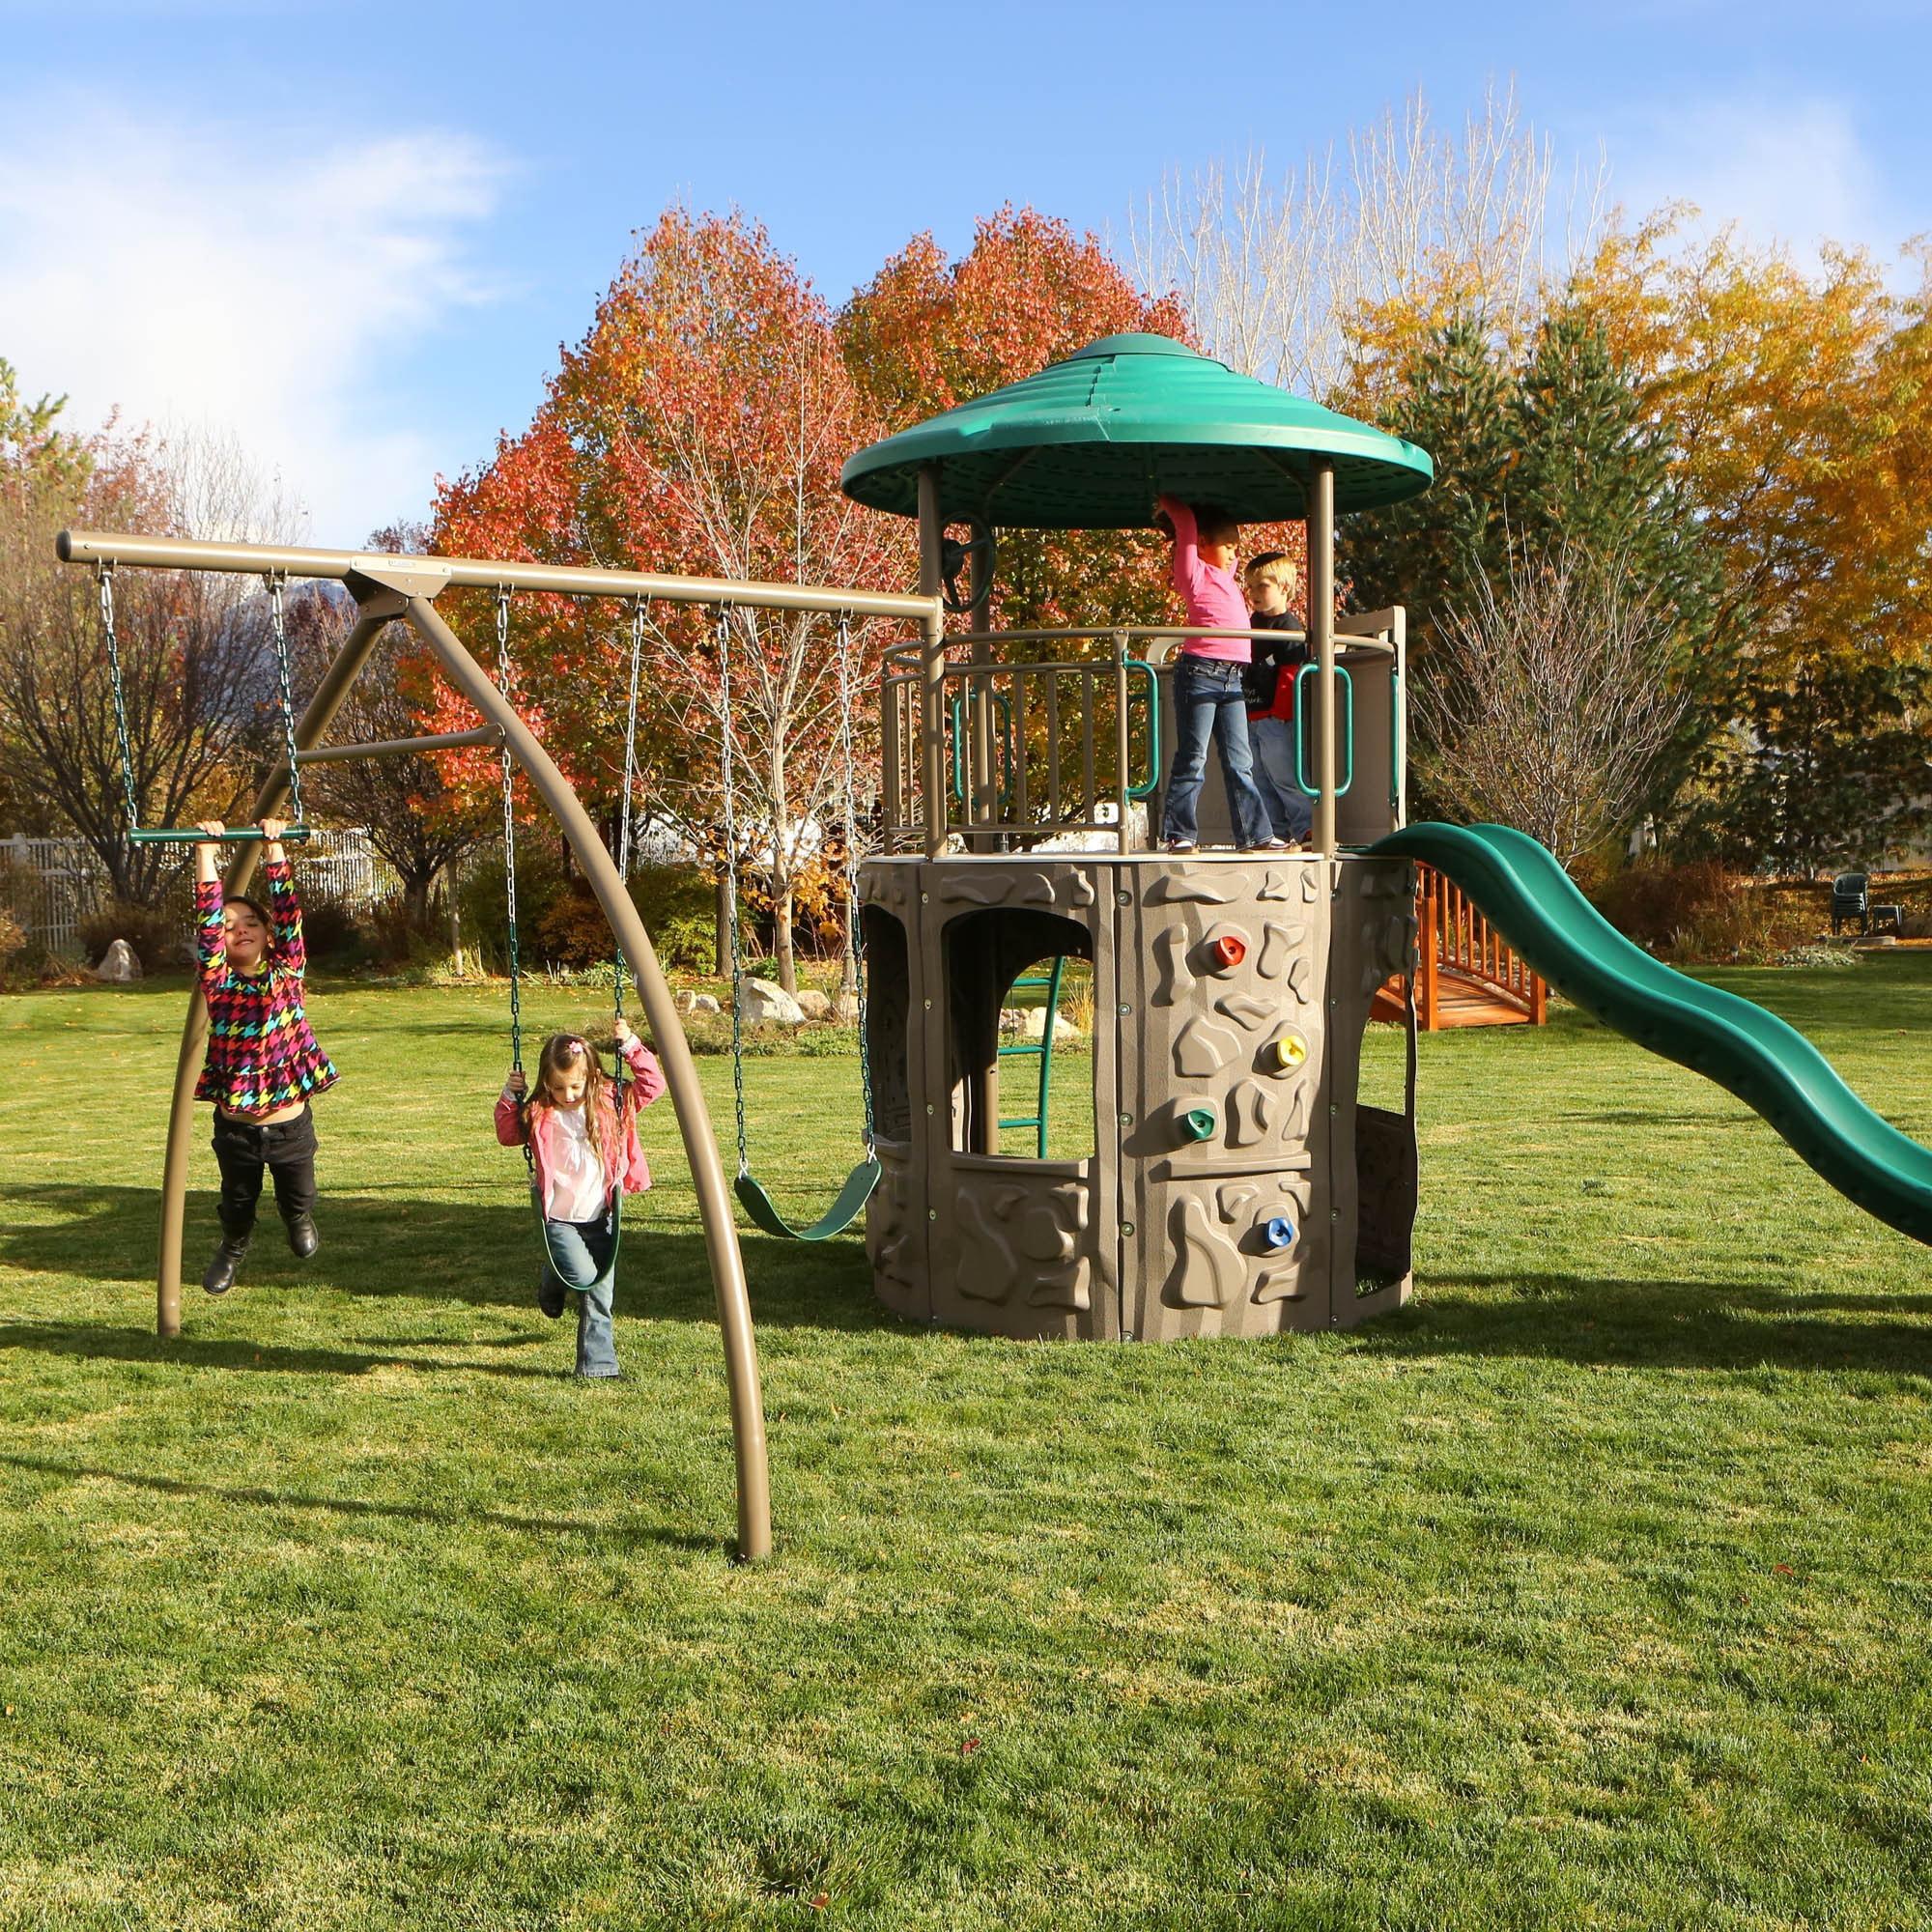 lifetime freestanding swing big sports adventure stuff dp play outdoors com amazon set